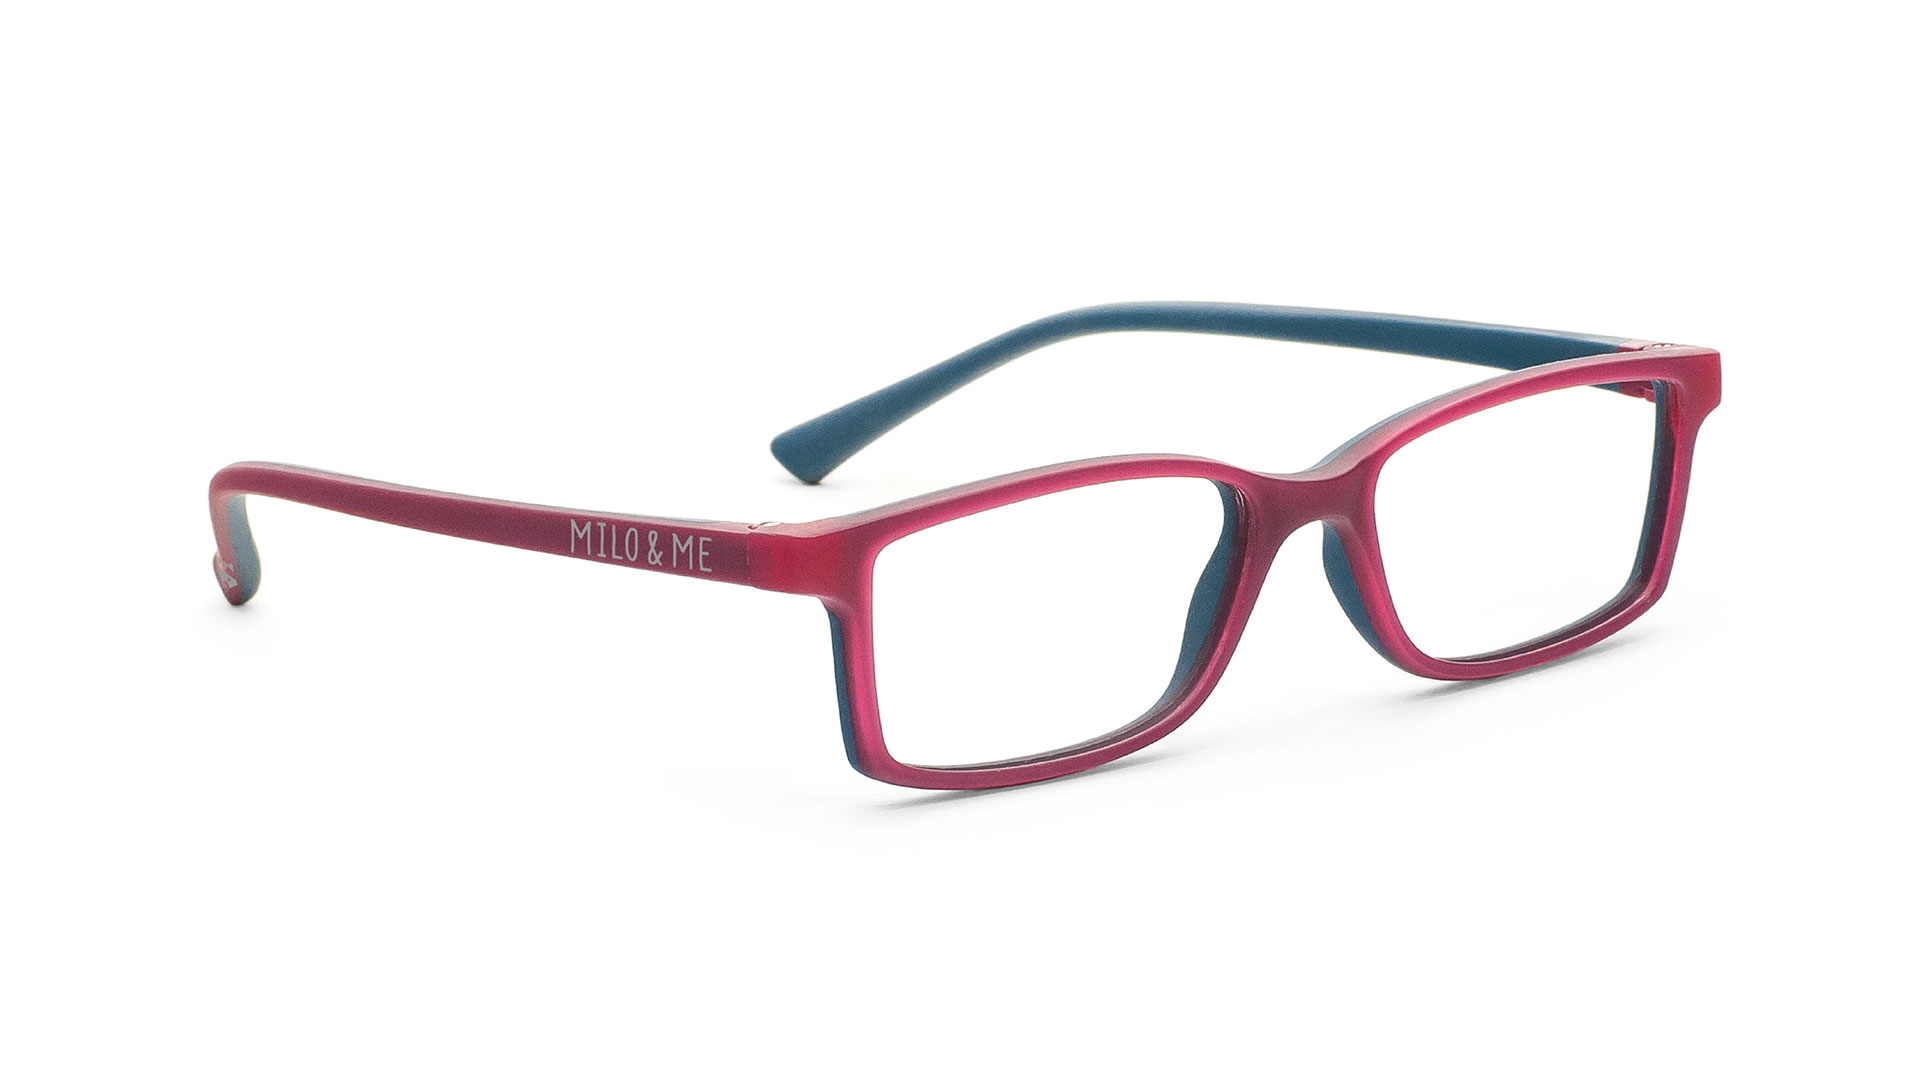 Blackberry-Dark Blue H85010-25 - Milo & Me Eyewear - Optimum RX Lens Specialists